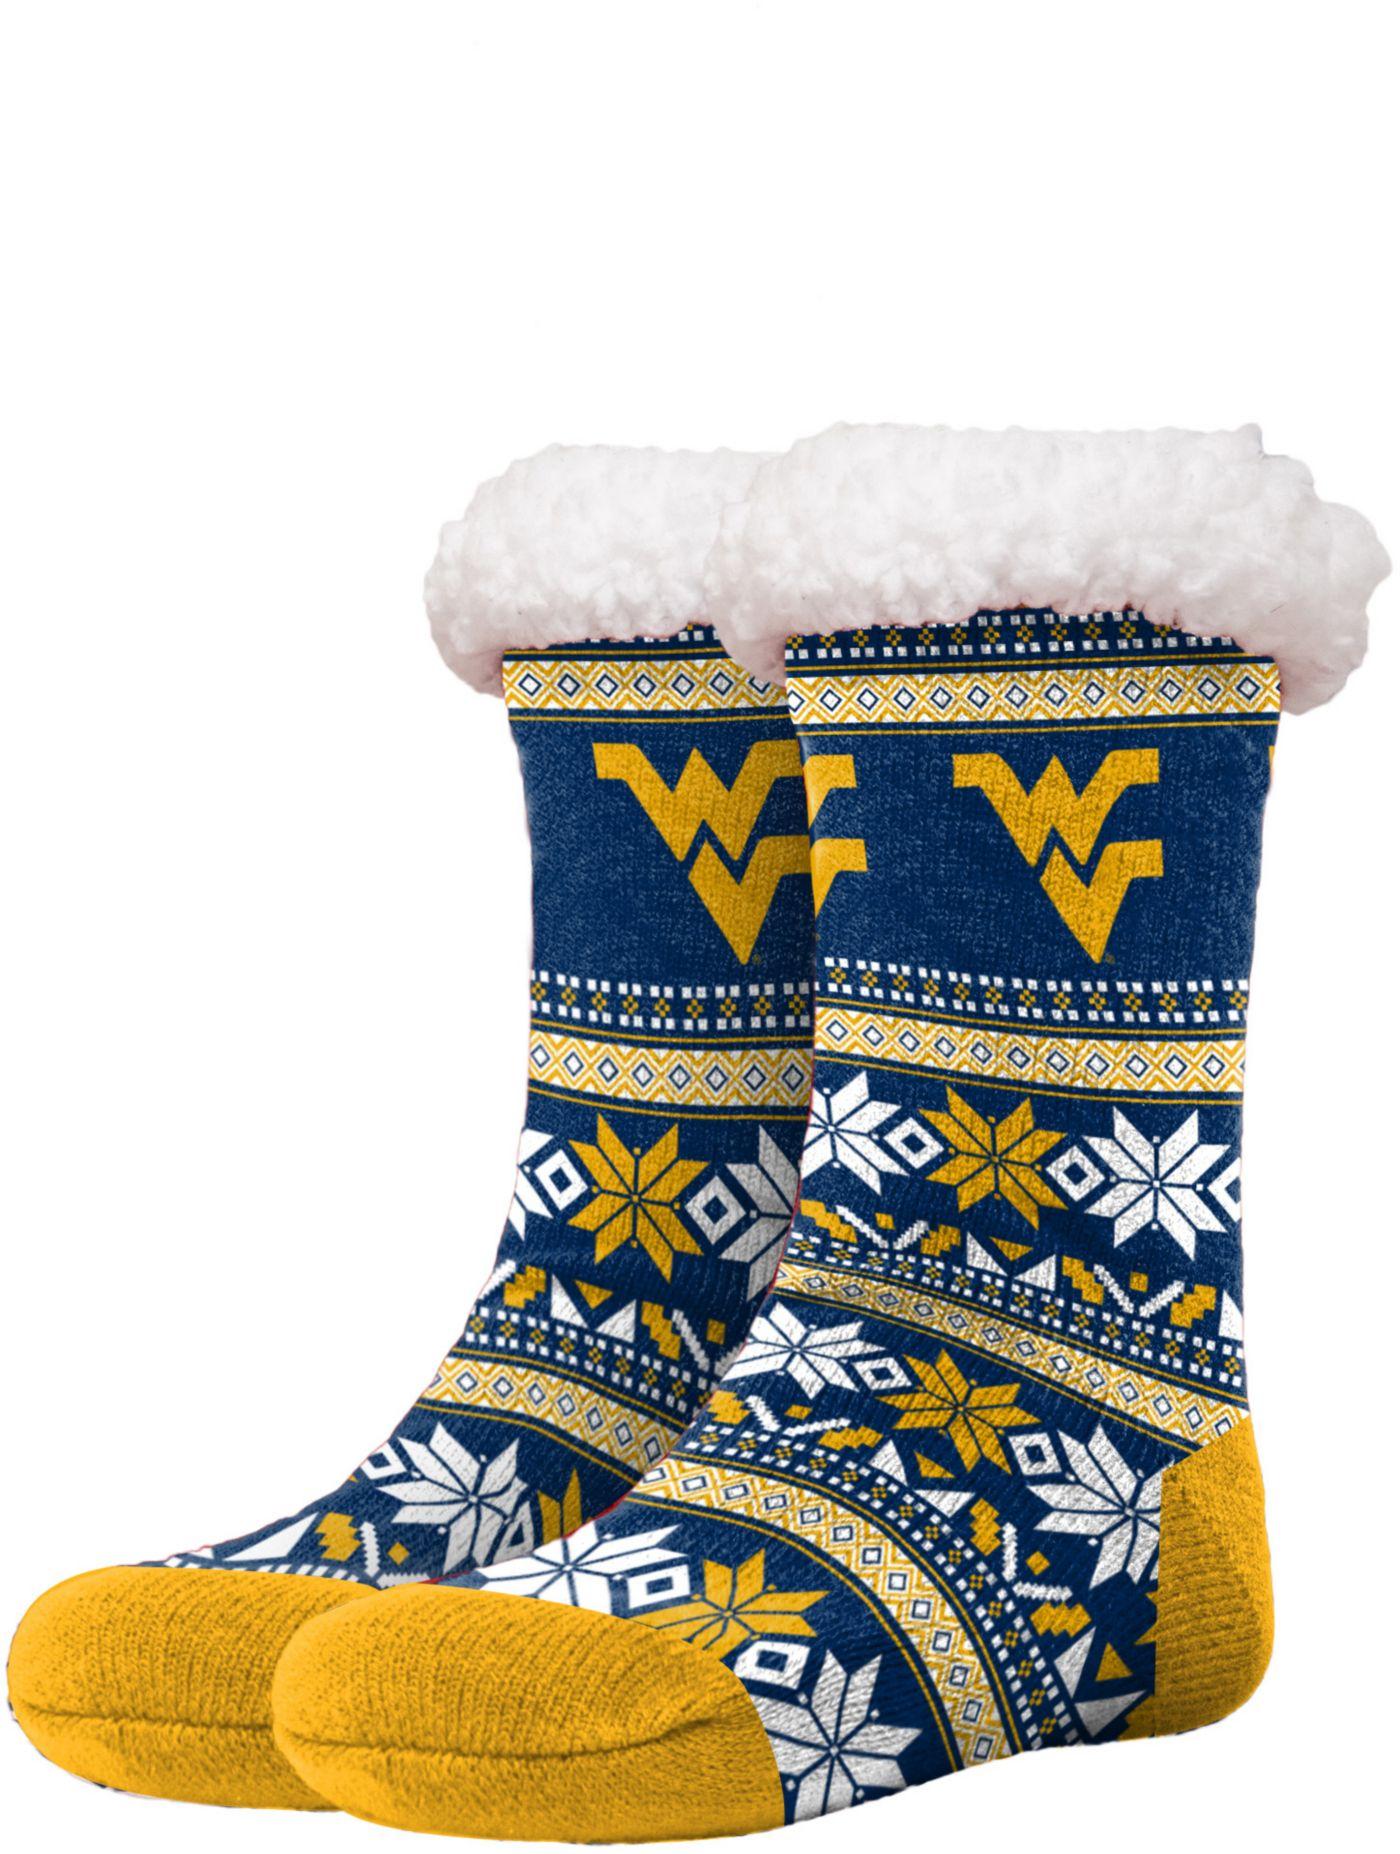 FOCO West Virginia Mountaineers Footy Slippers